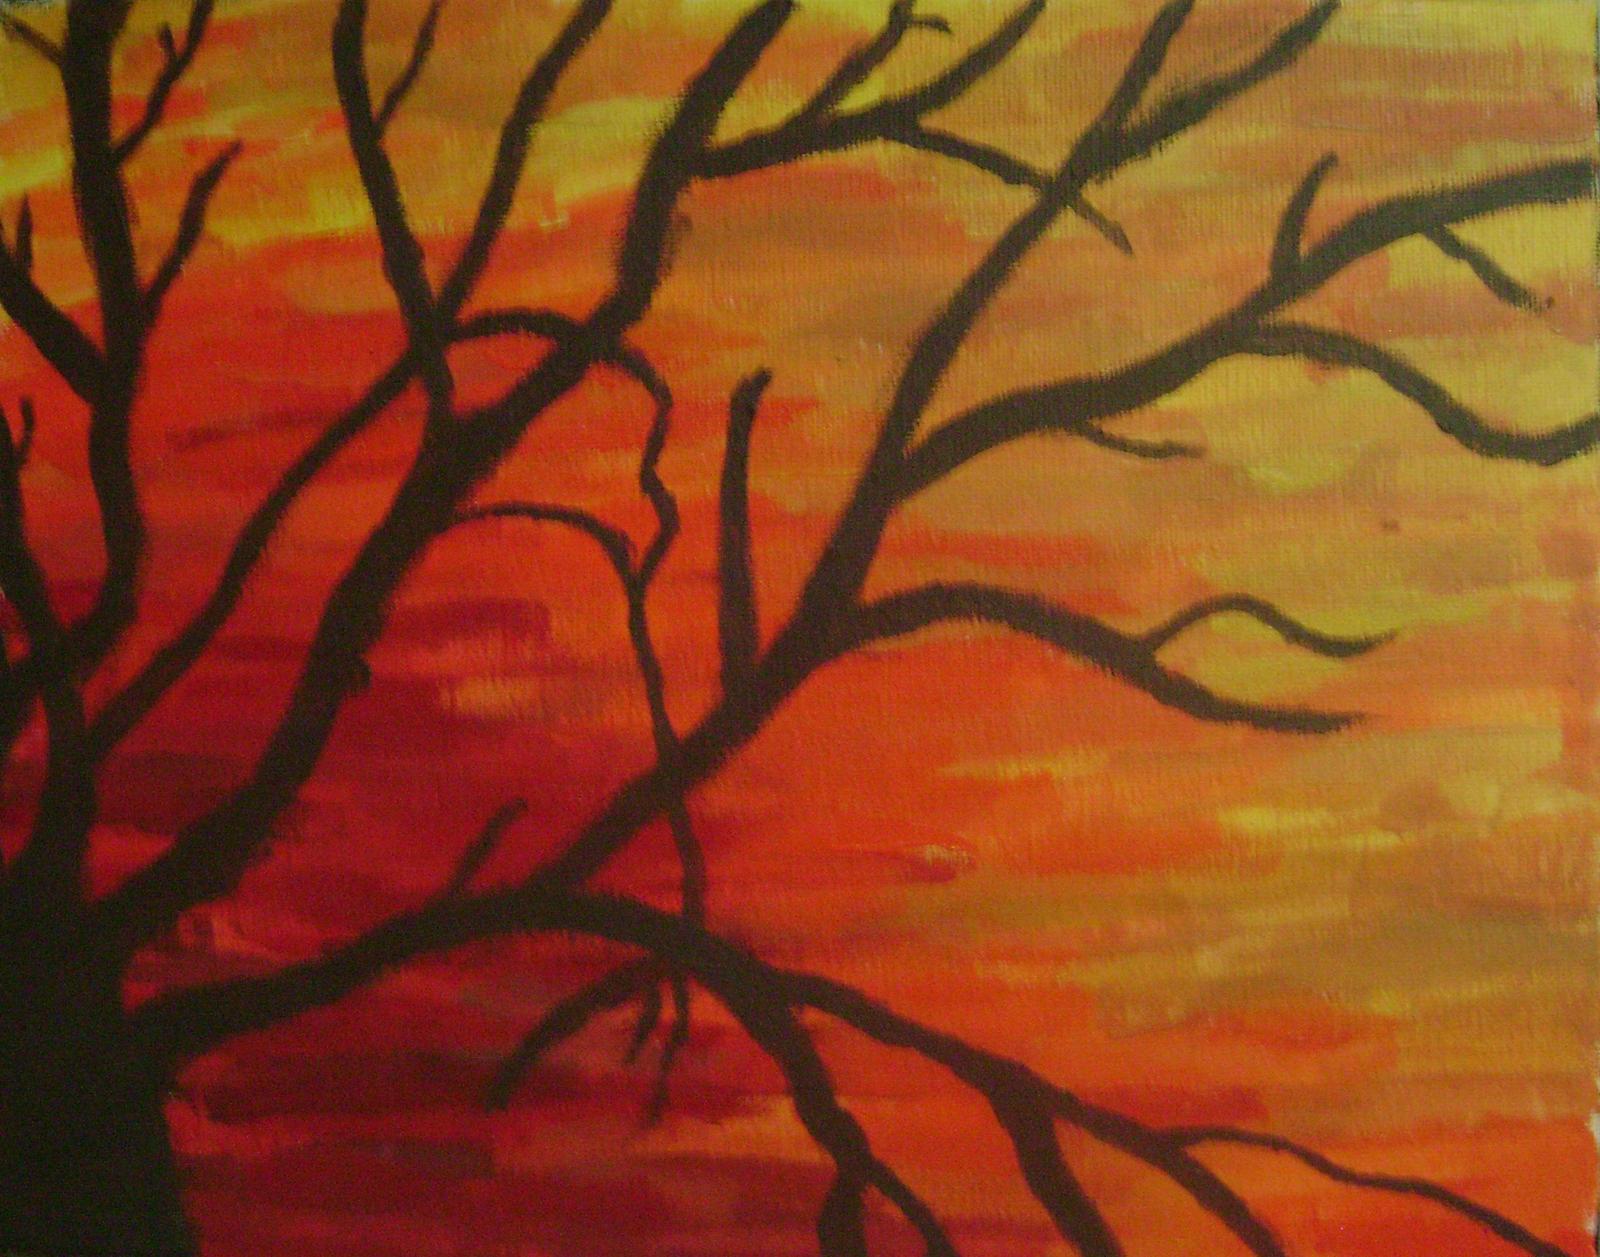 Silhouette Tree Paintings Silhouette Tree Oil